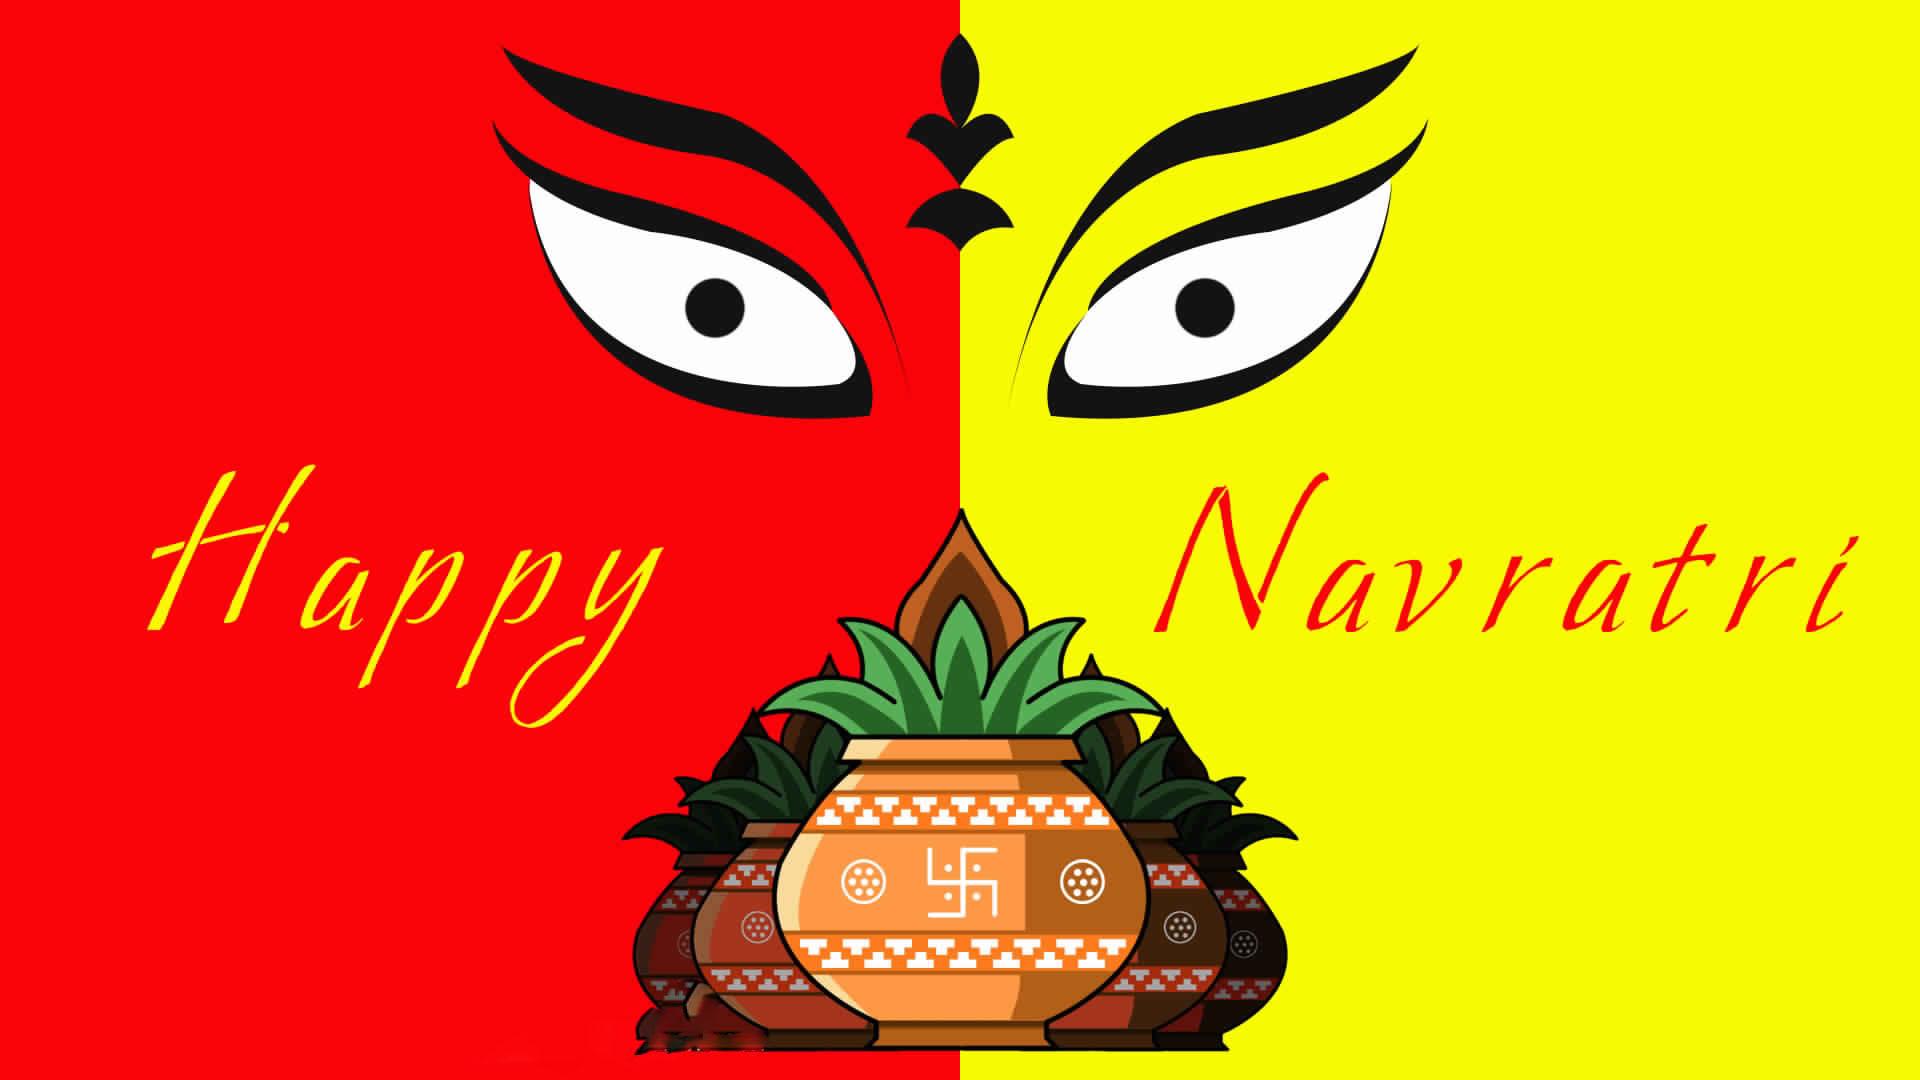 Navratri Wallpaper Hd For Mobile